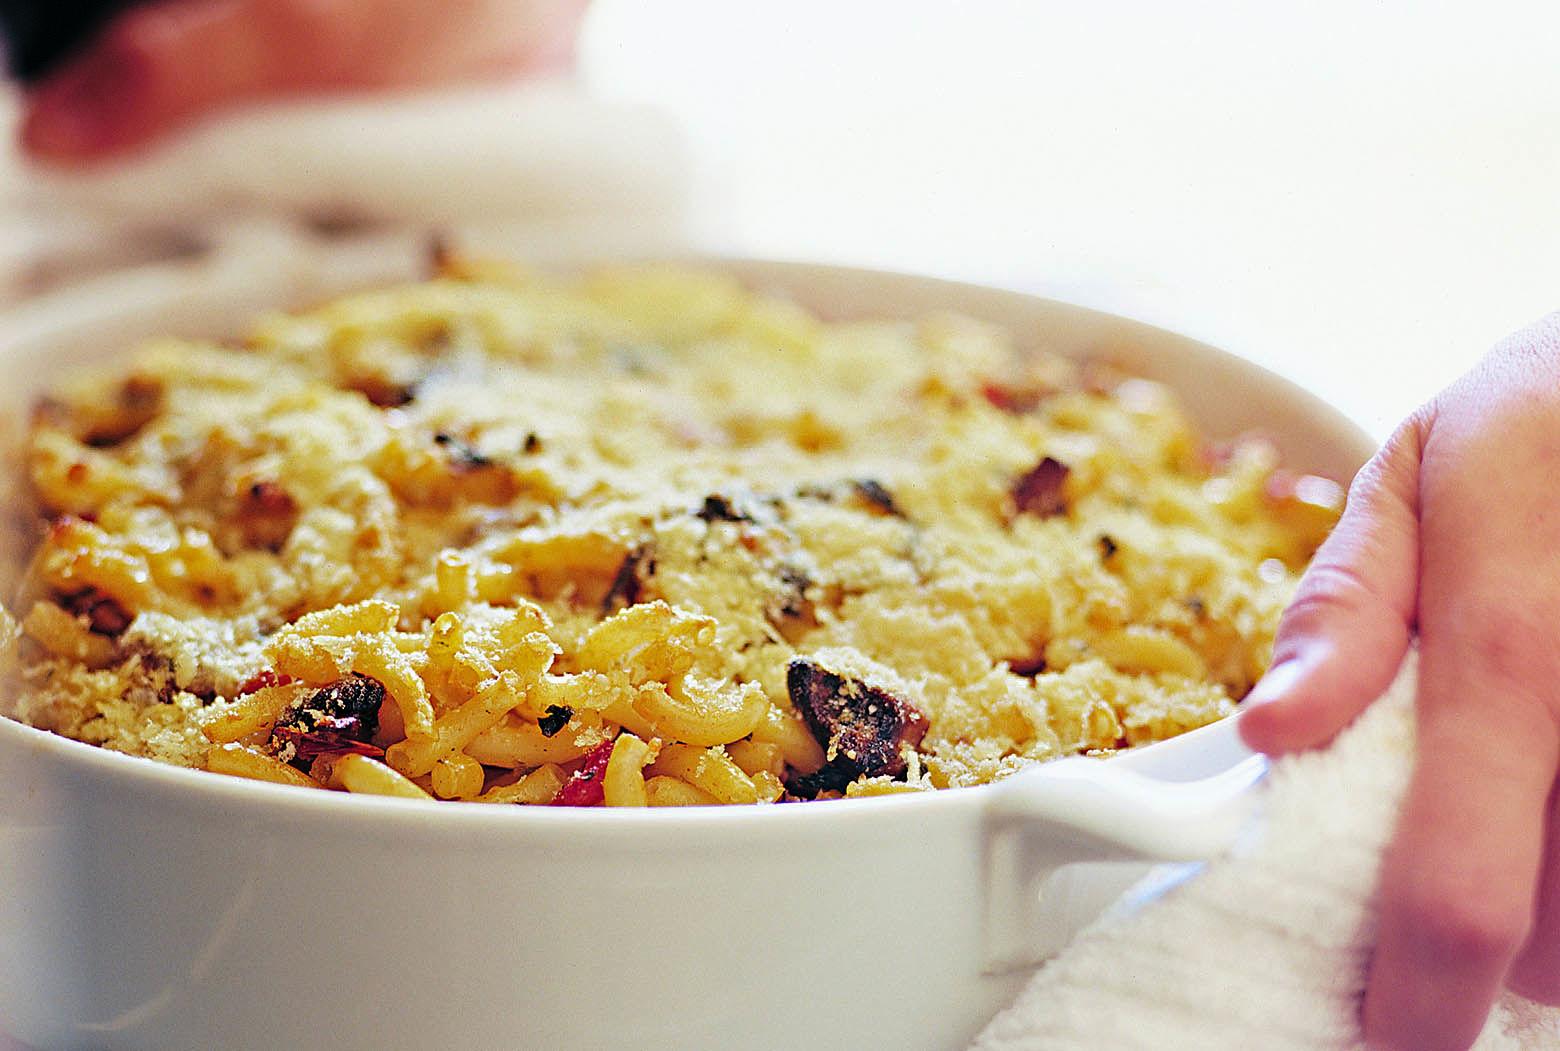 Spicy Baked Macaroni Recipe by Giada De Laurentiis